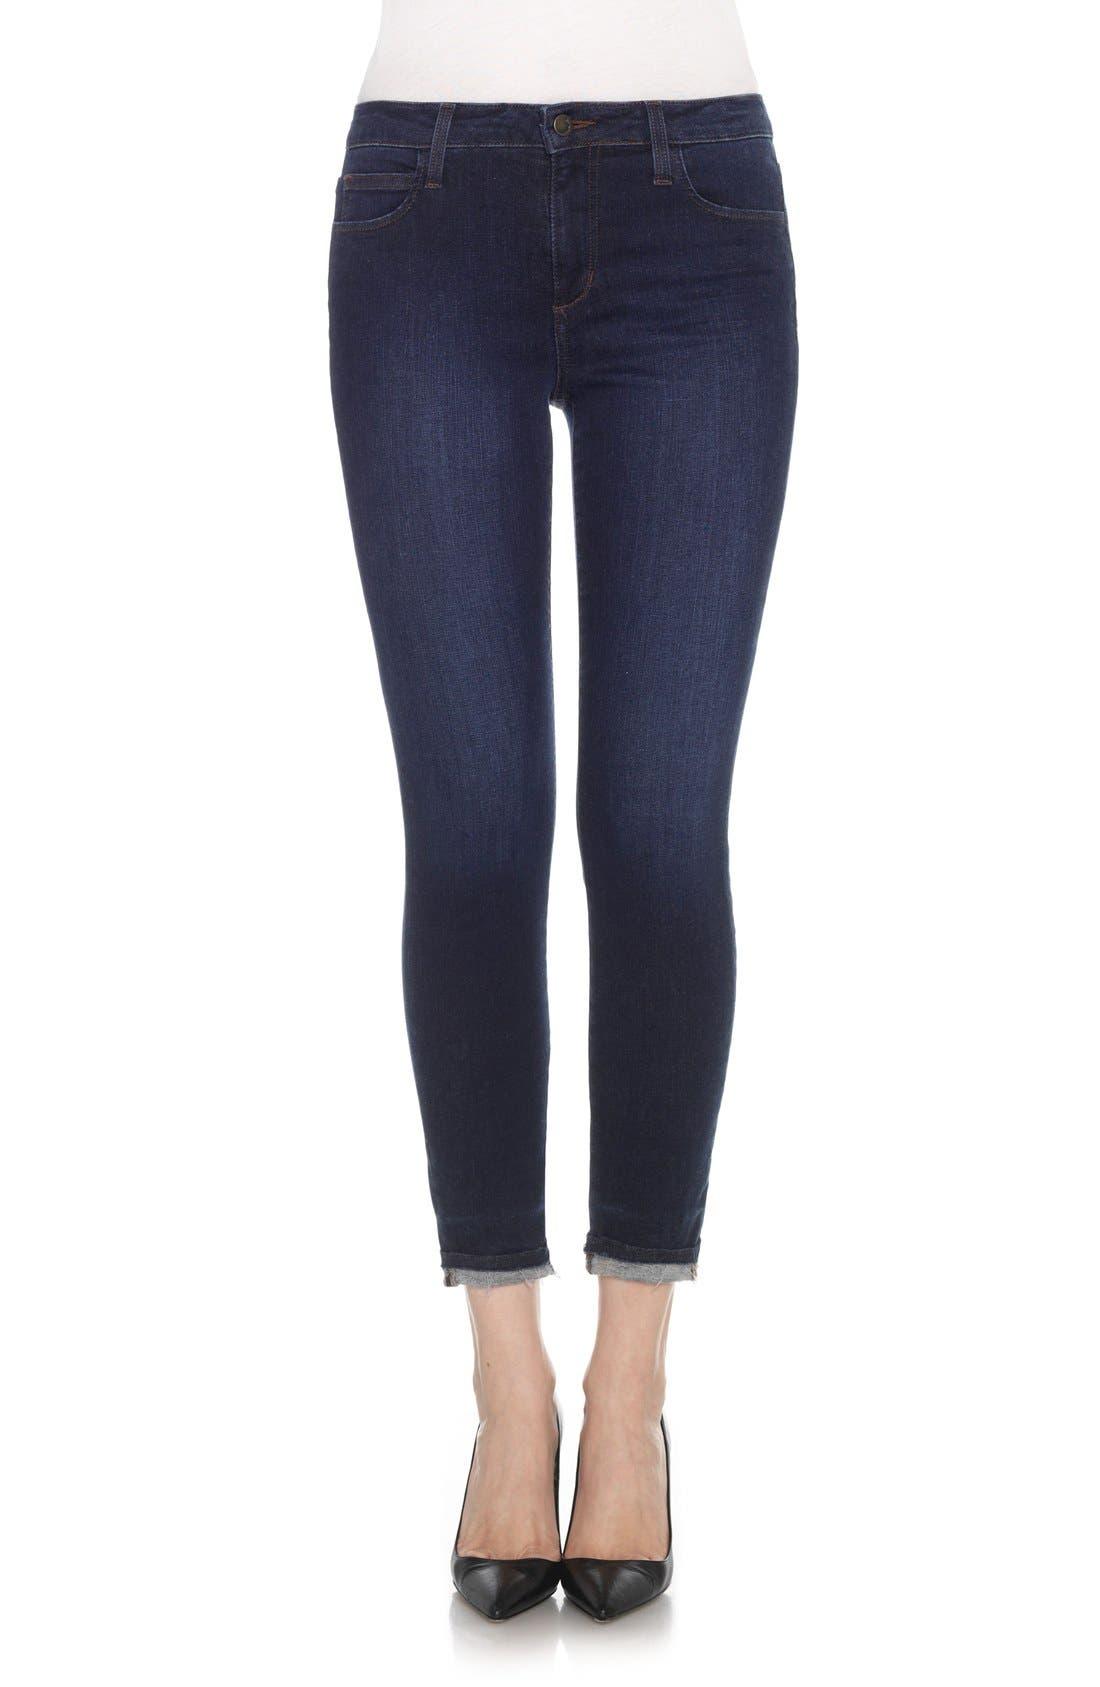 Main Image - Joe's Flawless - Markie Crop Skinny Jeans (Cammi)